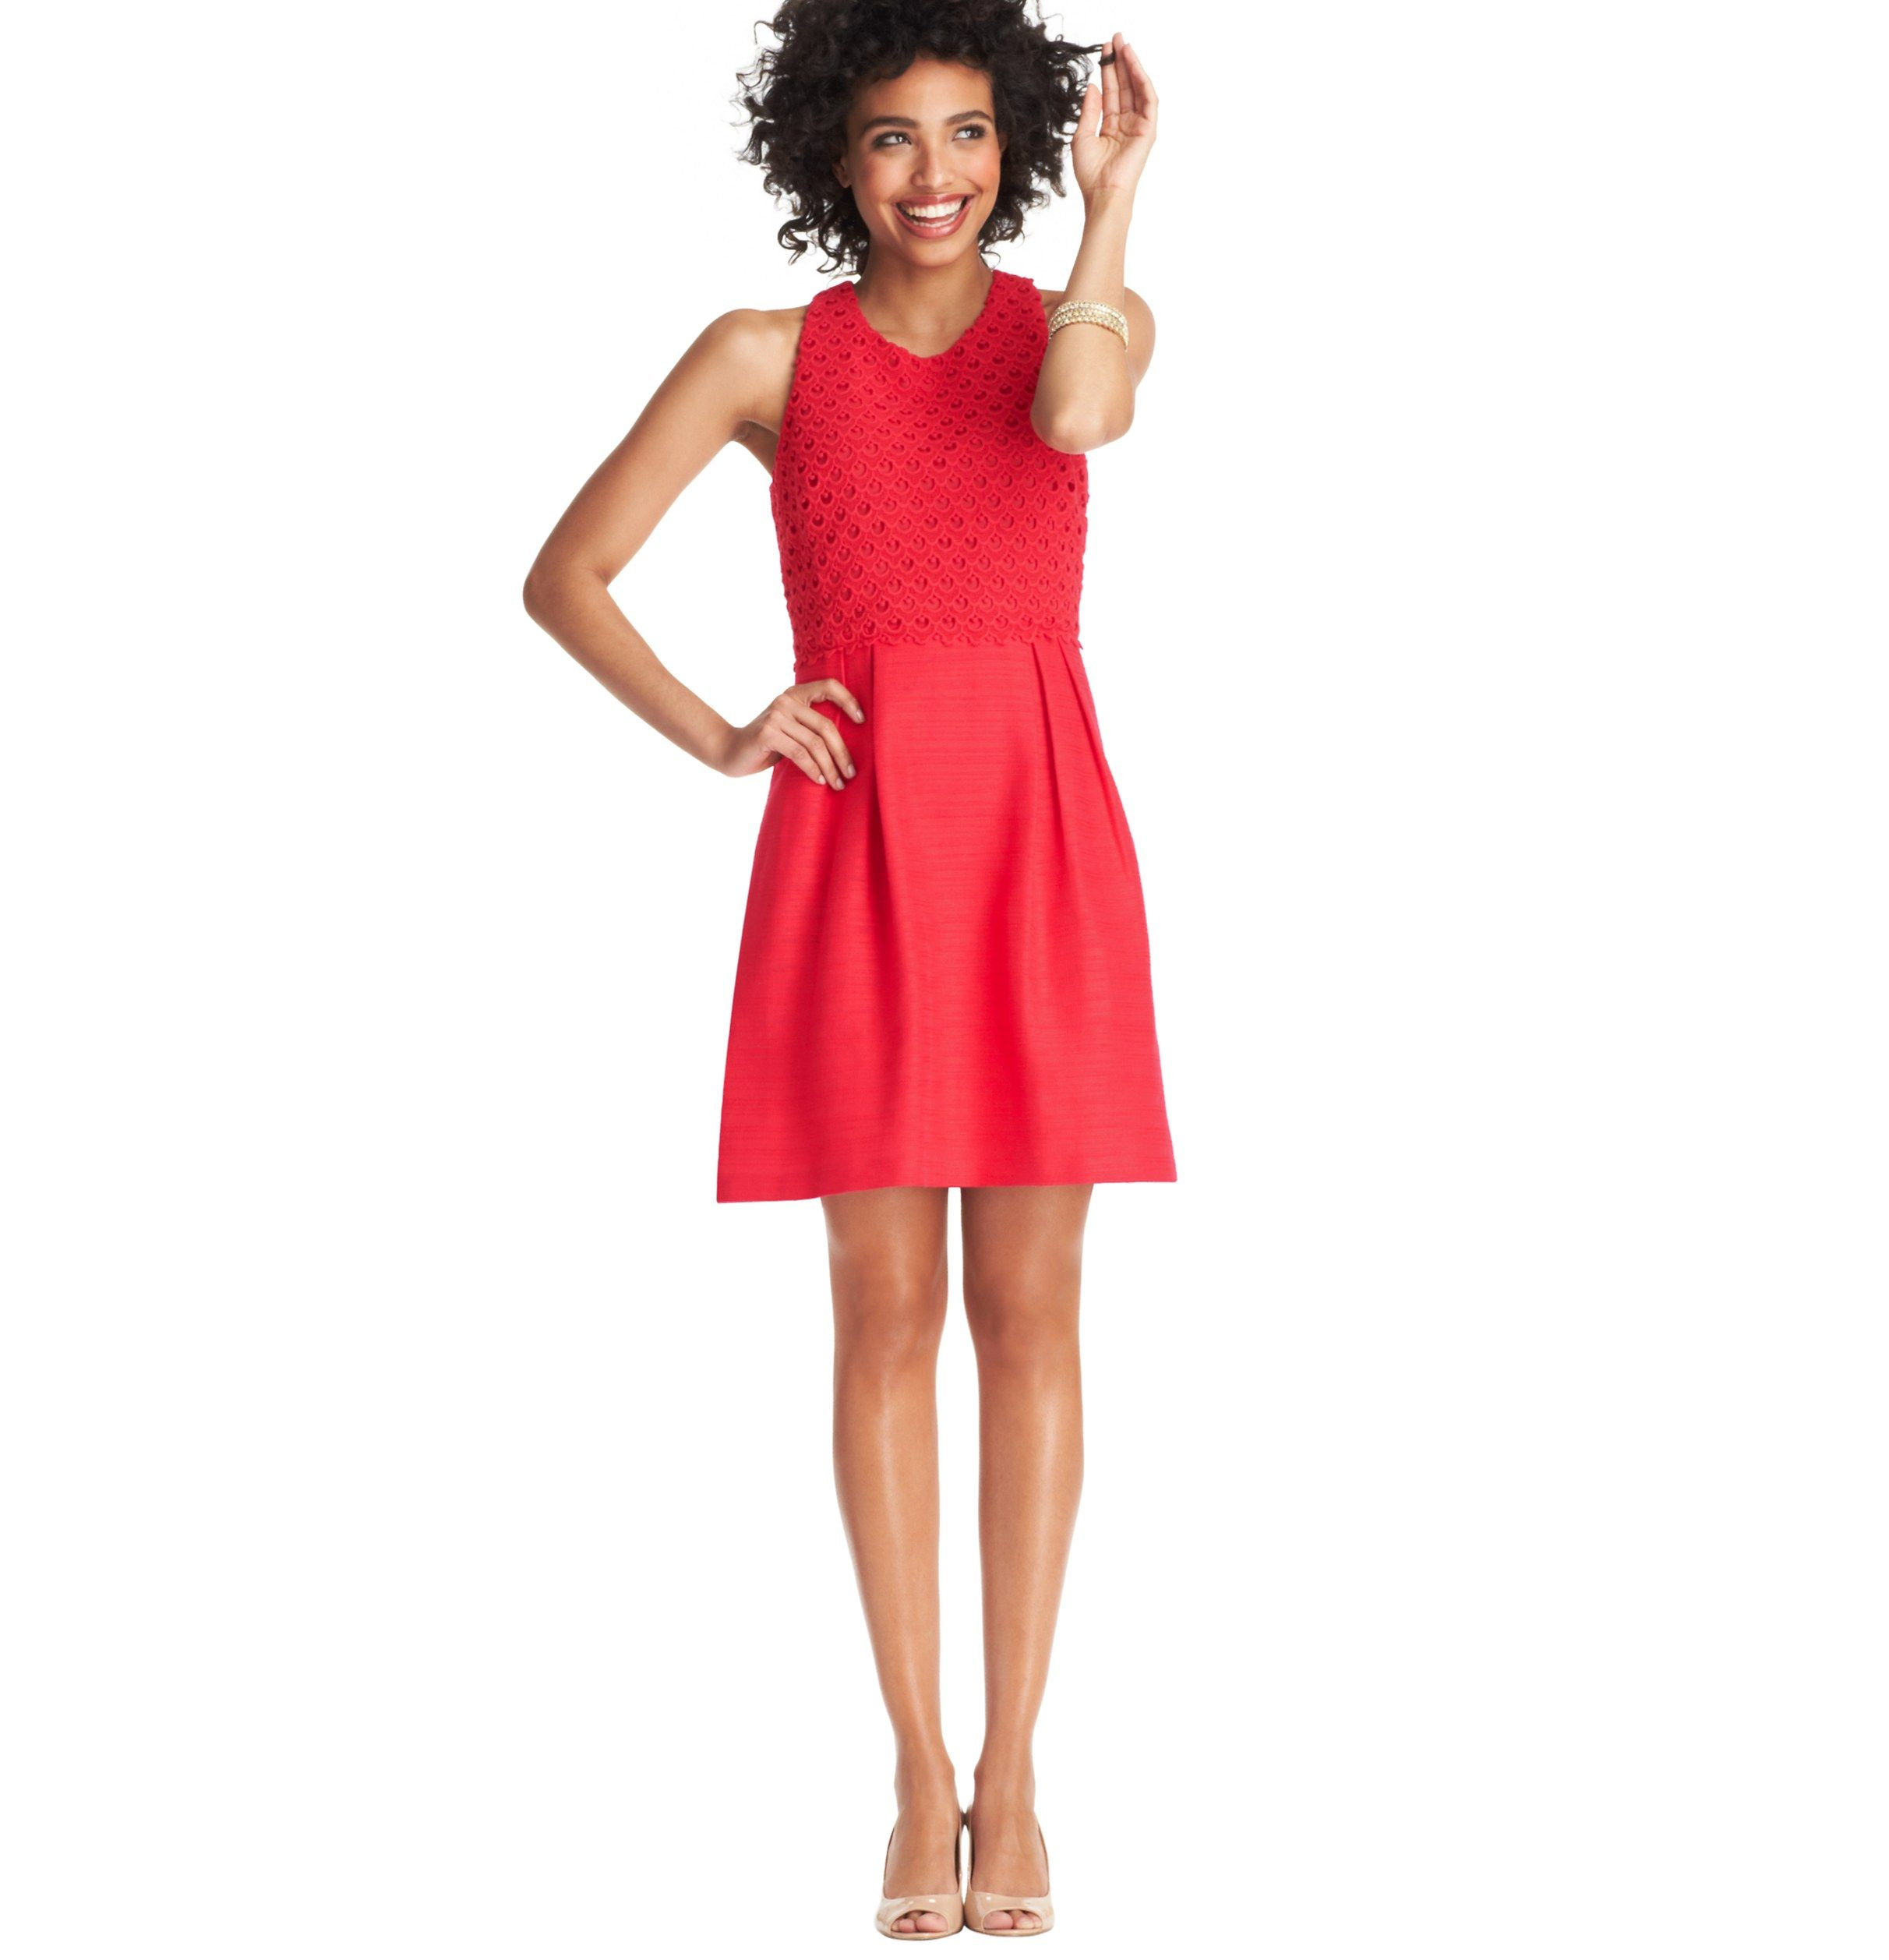 Textured Lace Bodice Full Skirt Dress | Loft